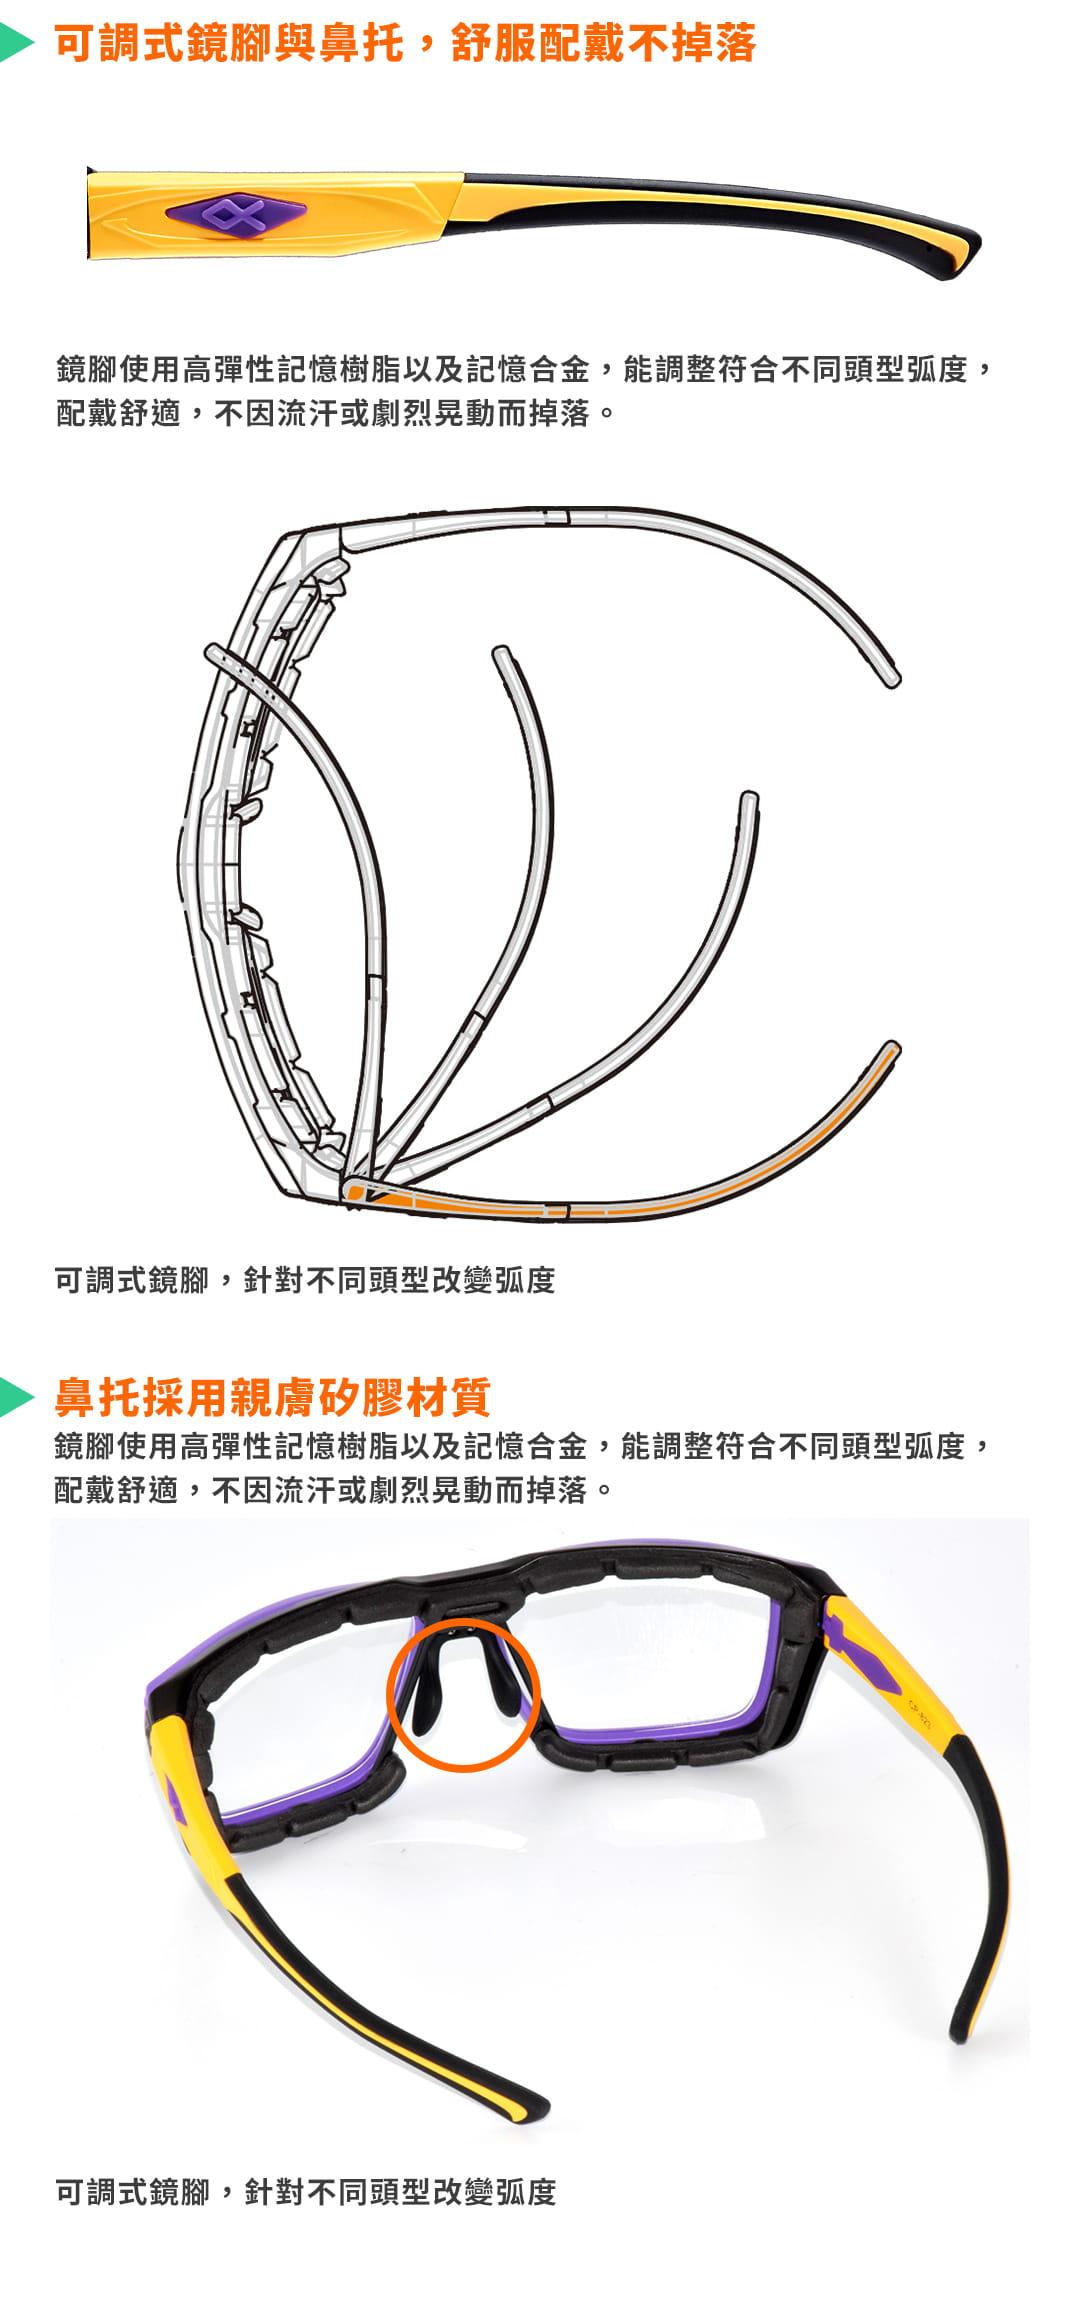 SABLE黑貂光學-專屬球類運動眼鏡CP-823(標準款-無保護墊)+SP-03(平光精緻鍍膜鏡片) 4